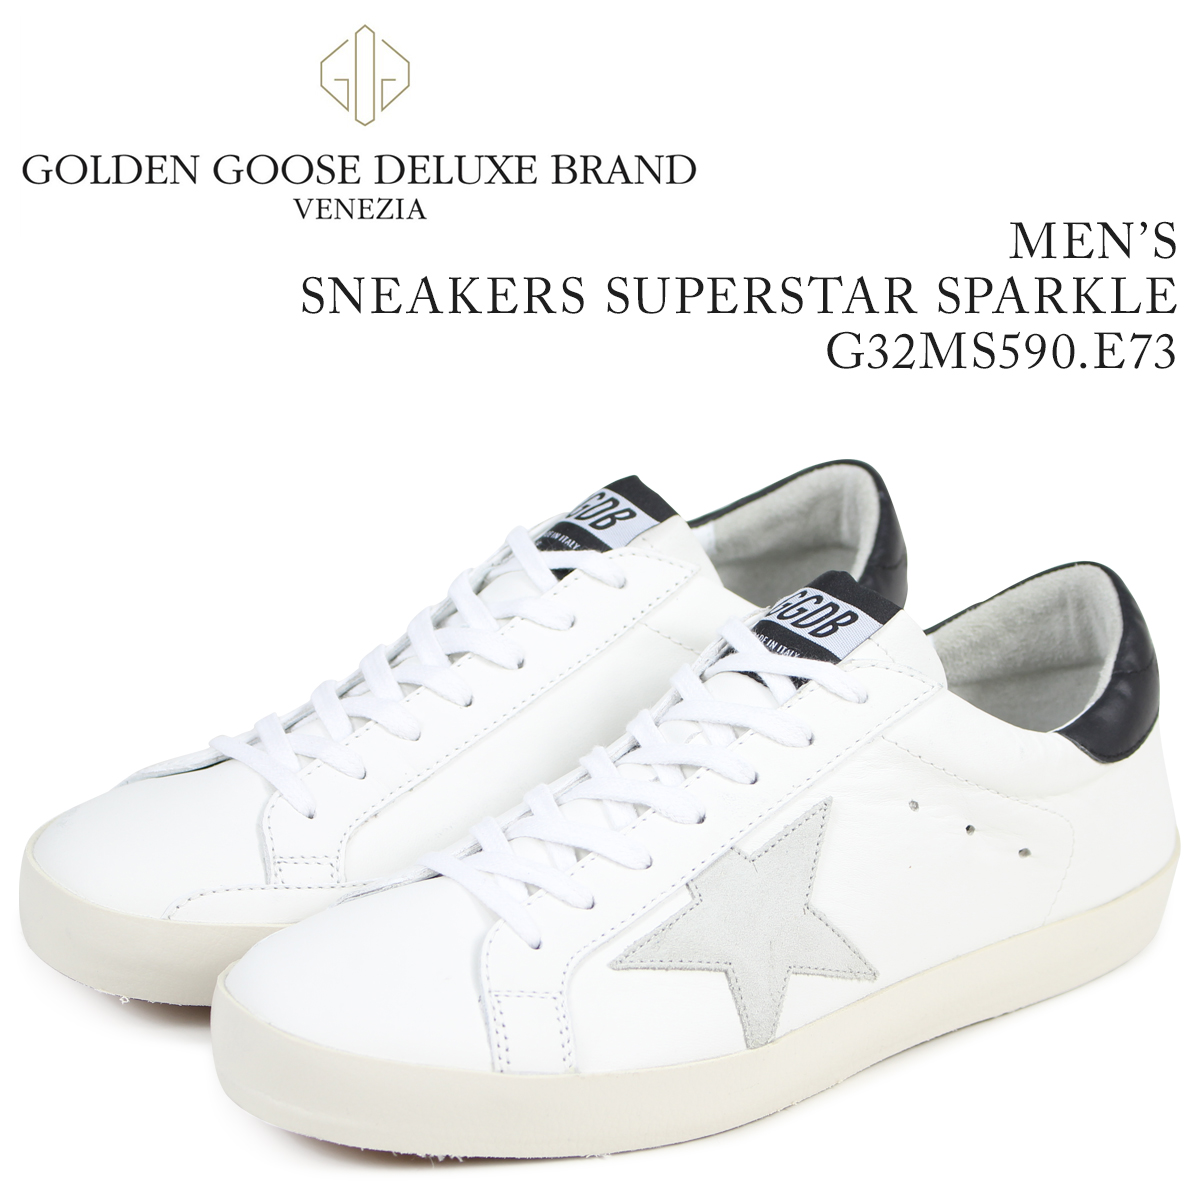 cd70ab5d2c7 Golden Goose golden goose sneakers men superstar SNEAKERS SUPERSTAR SPARKLE  white G32MS590 E73  load planned Shinnyu load in reservation product 3 15  ...